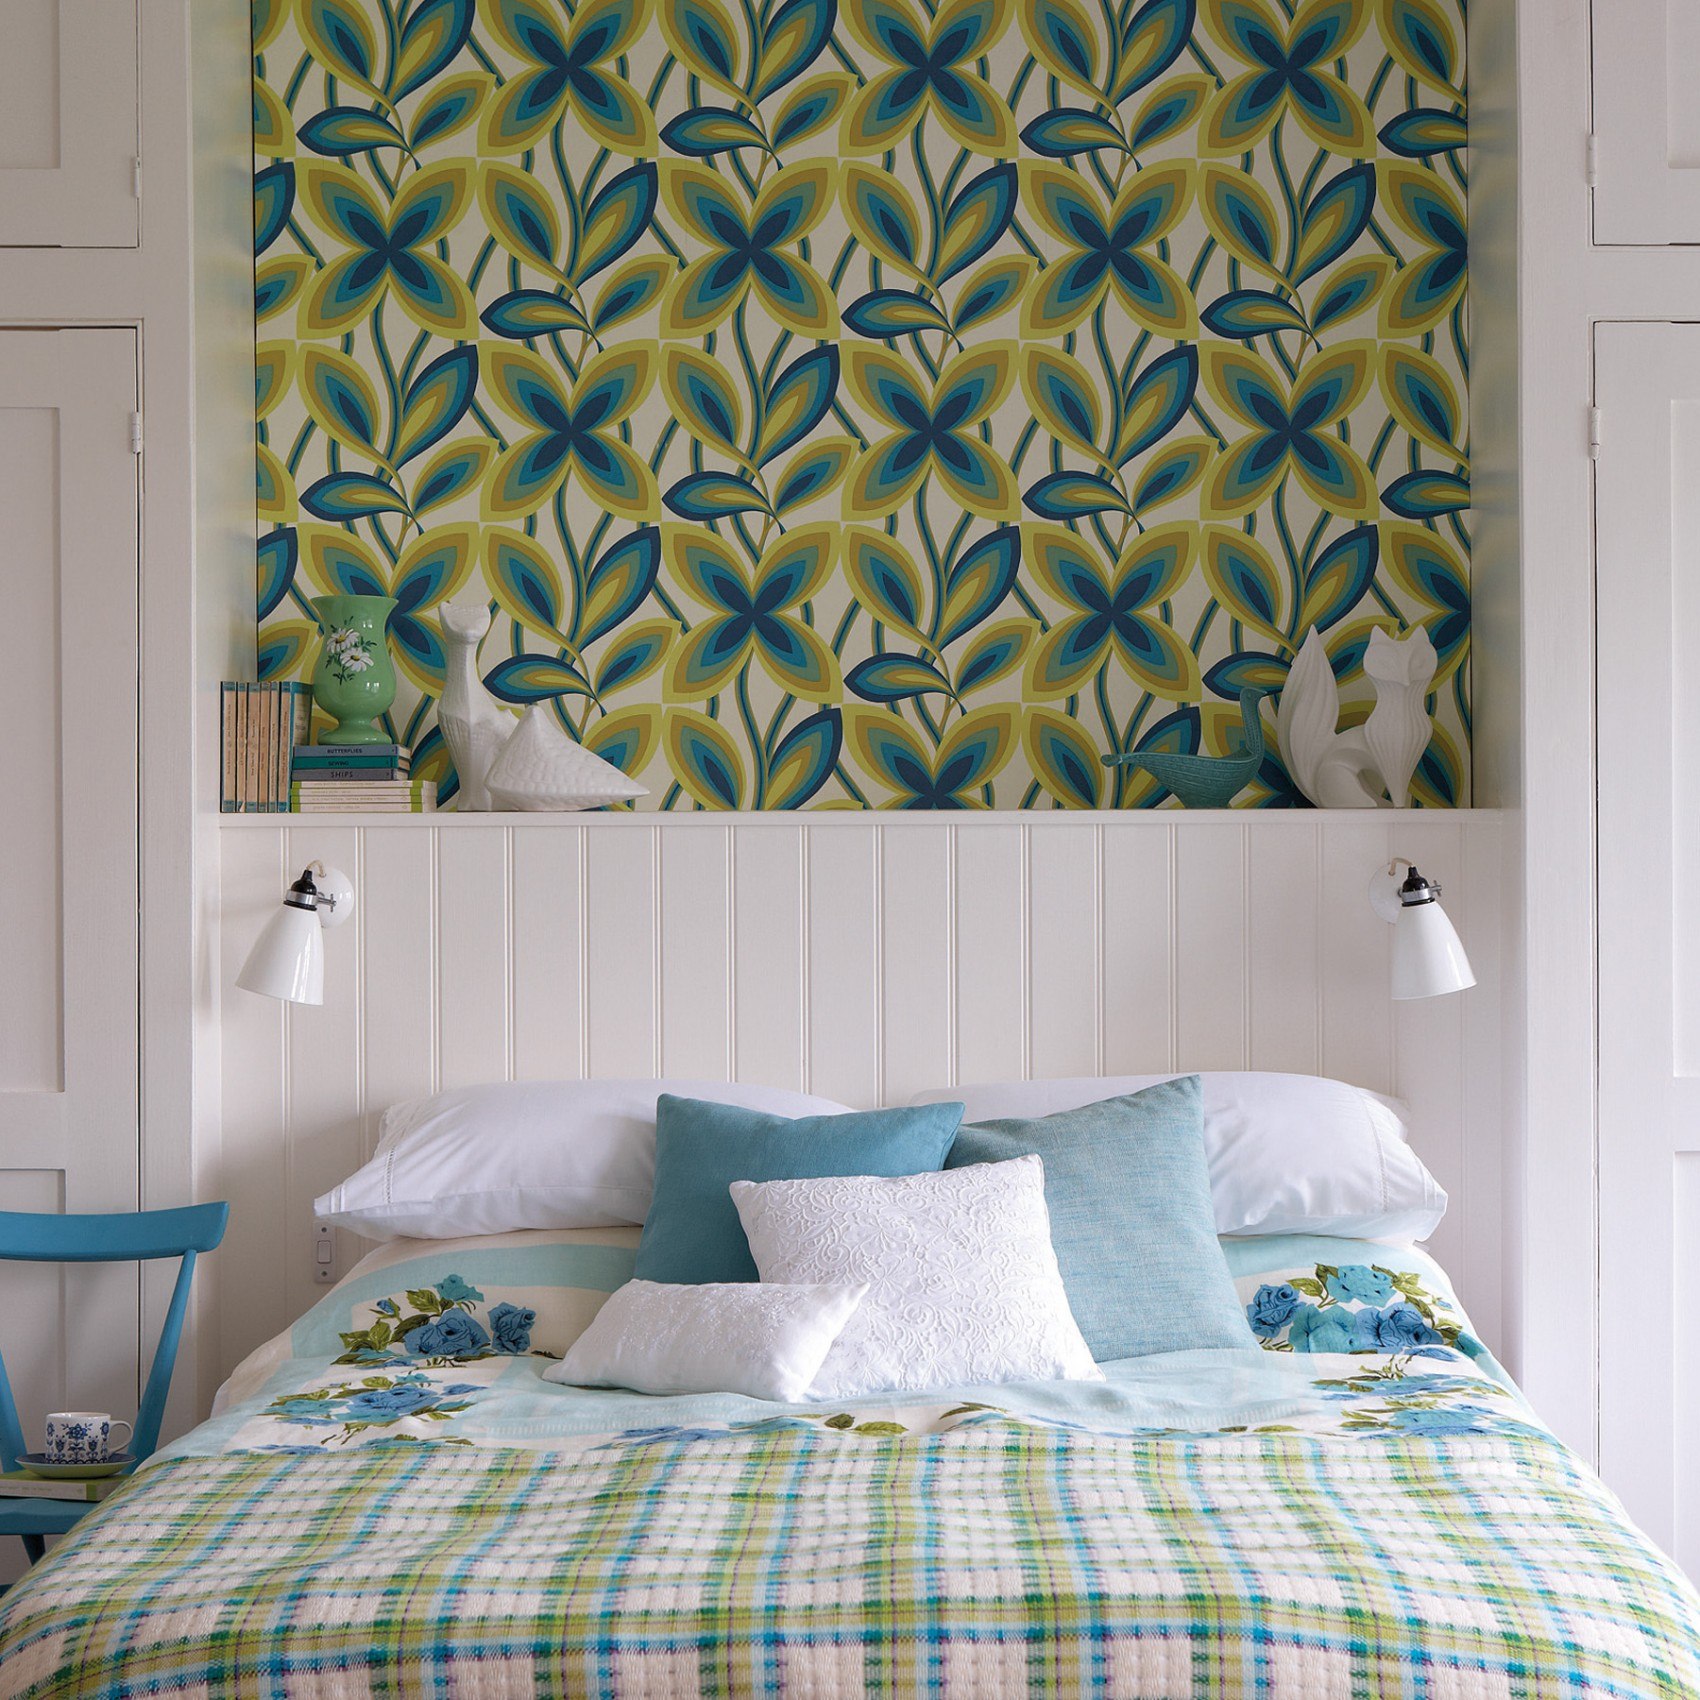 Starflower - Peacock Wallpaper